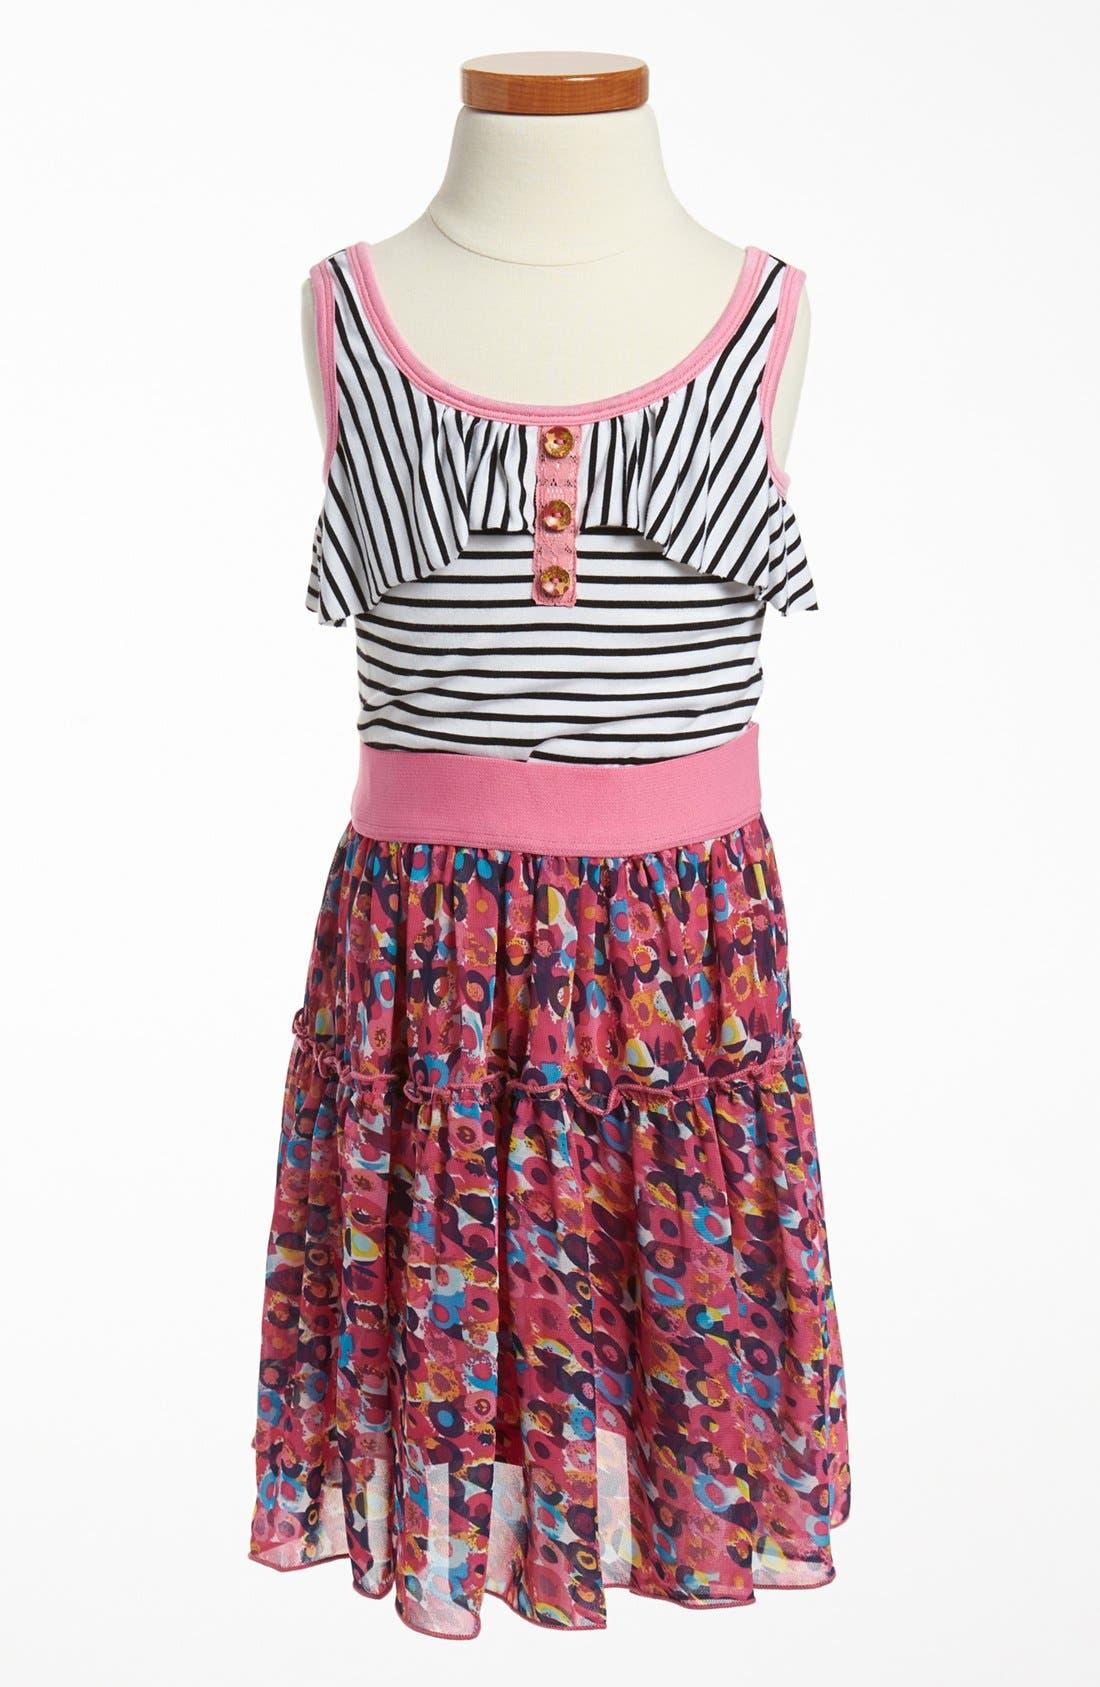 Alternate Image 1 Selected - Truly Me Sleeveless Stripe Dress (Little Girls & Big Girls)